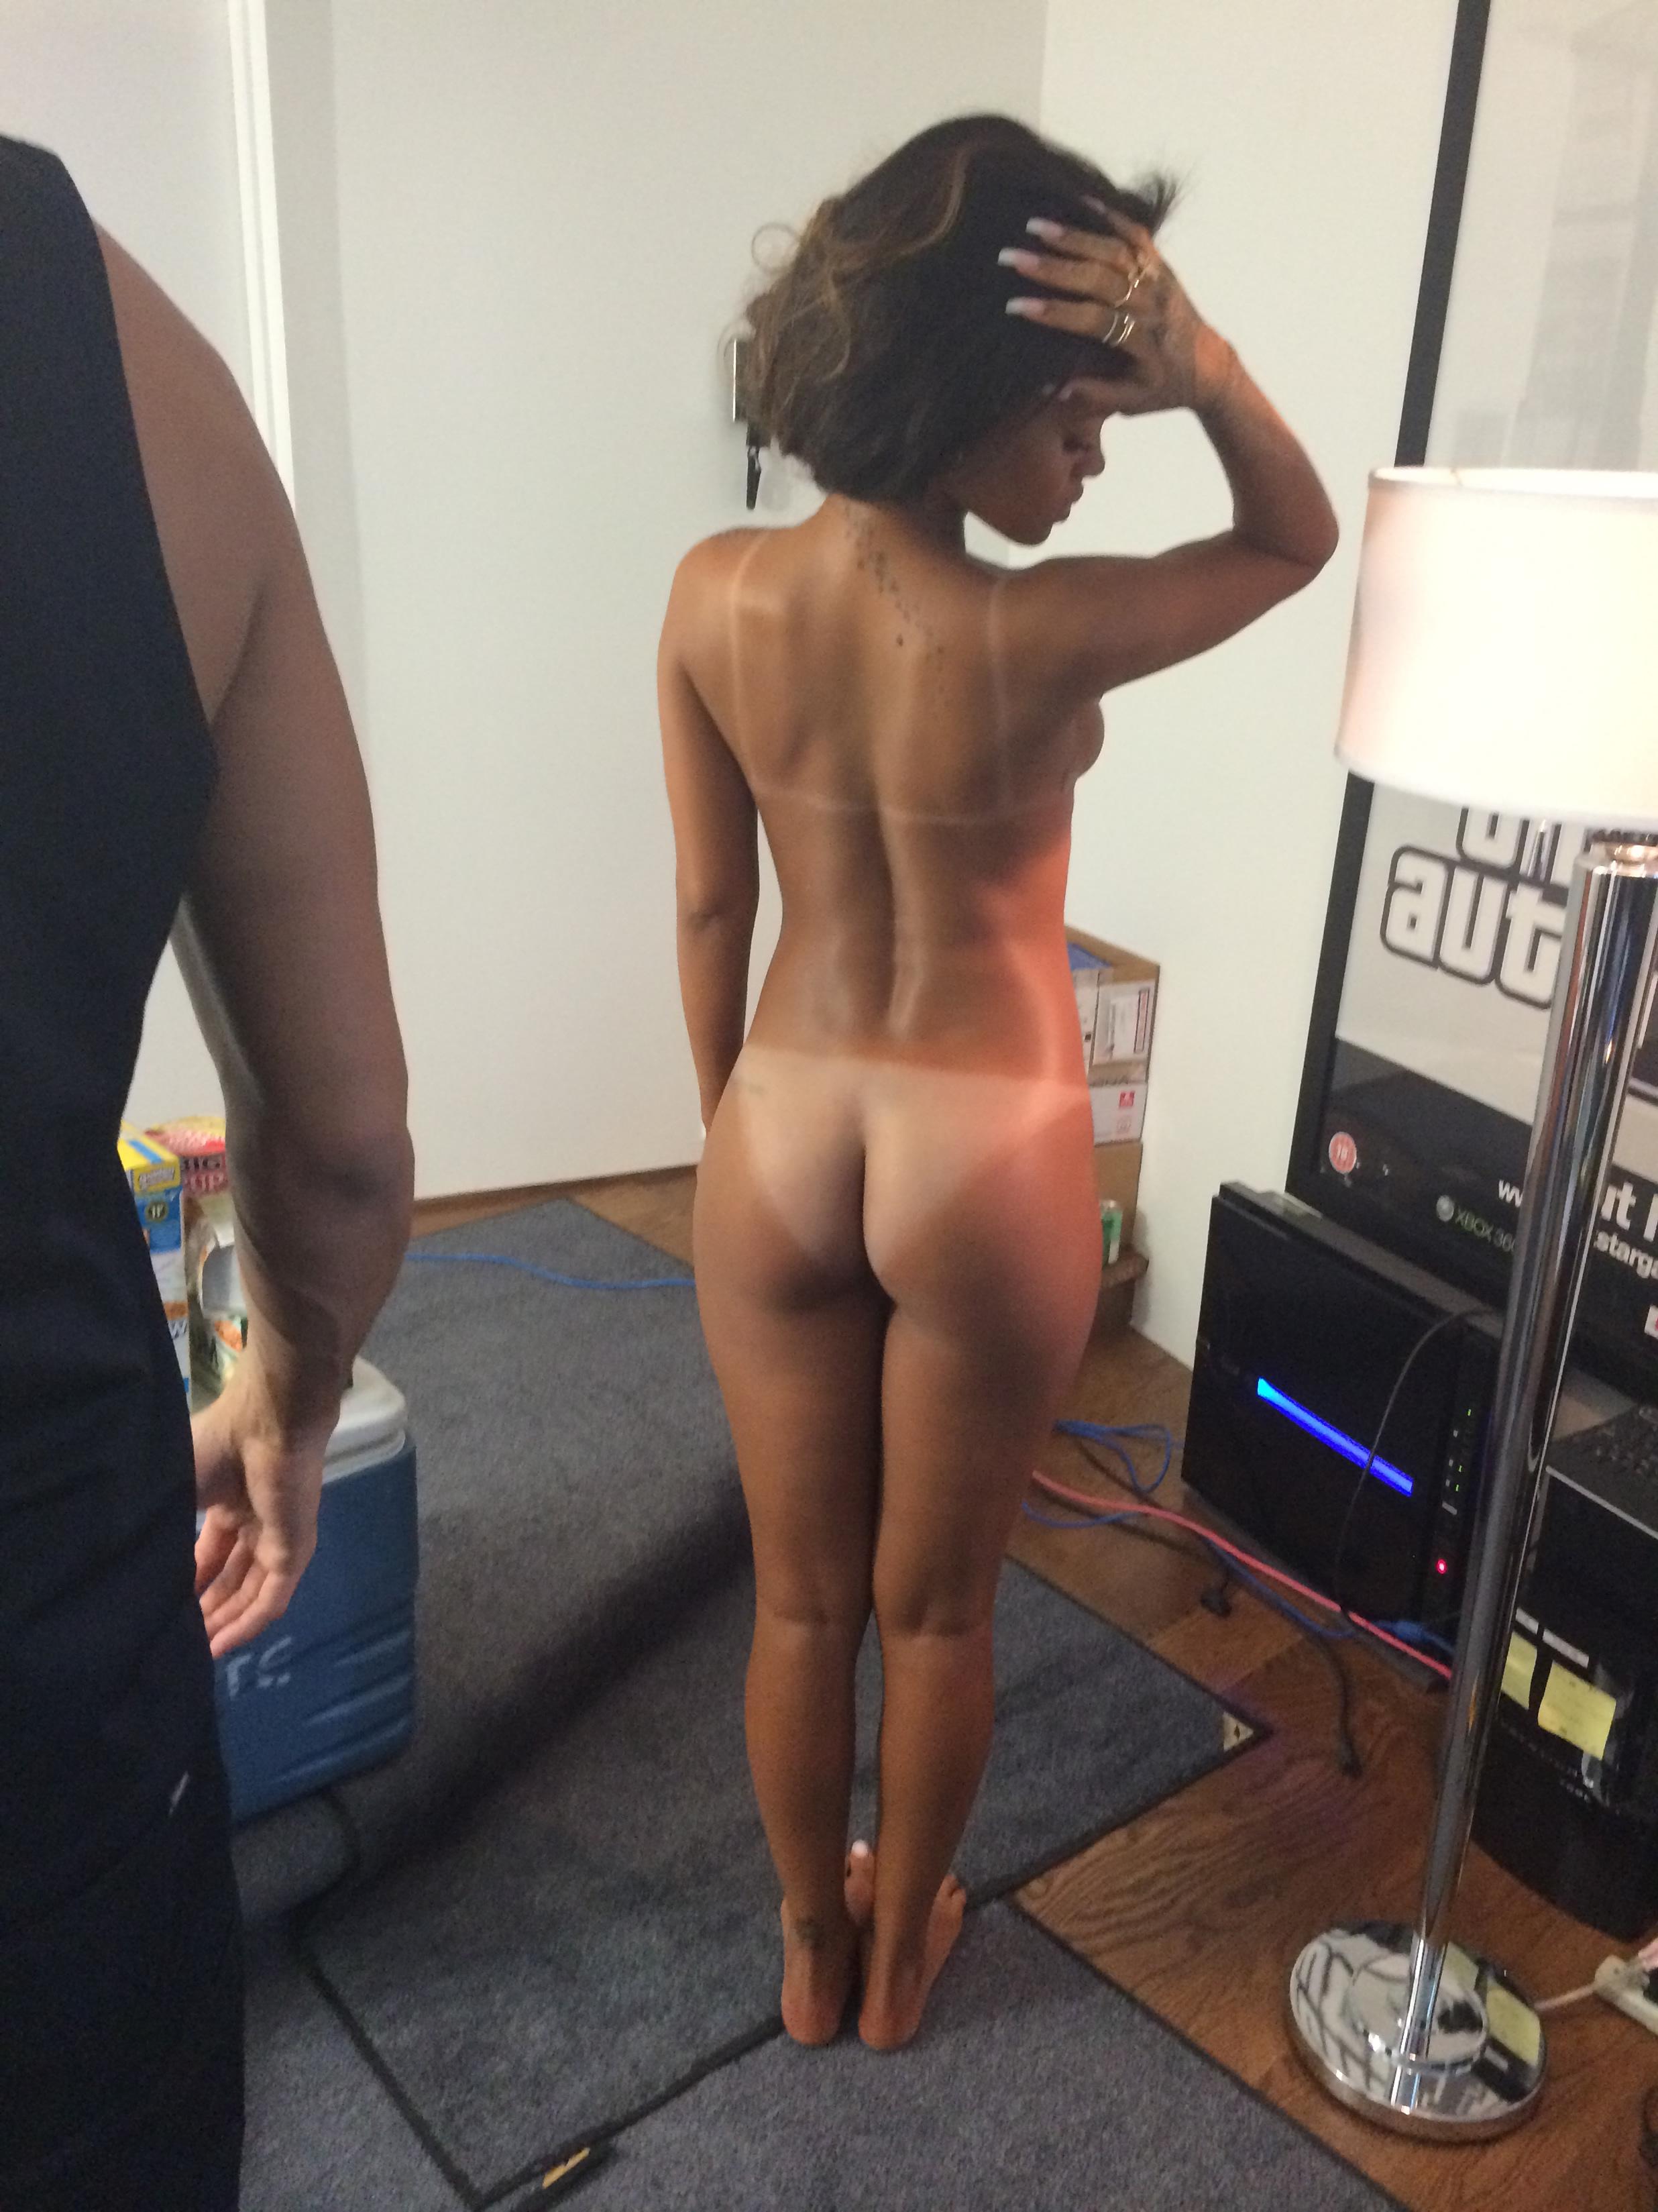 ThE nude model girL Erica )